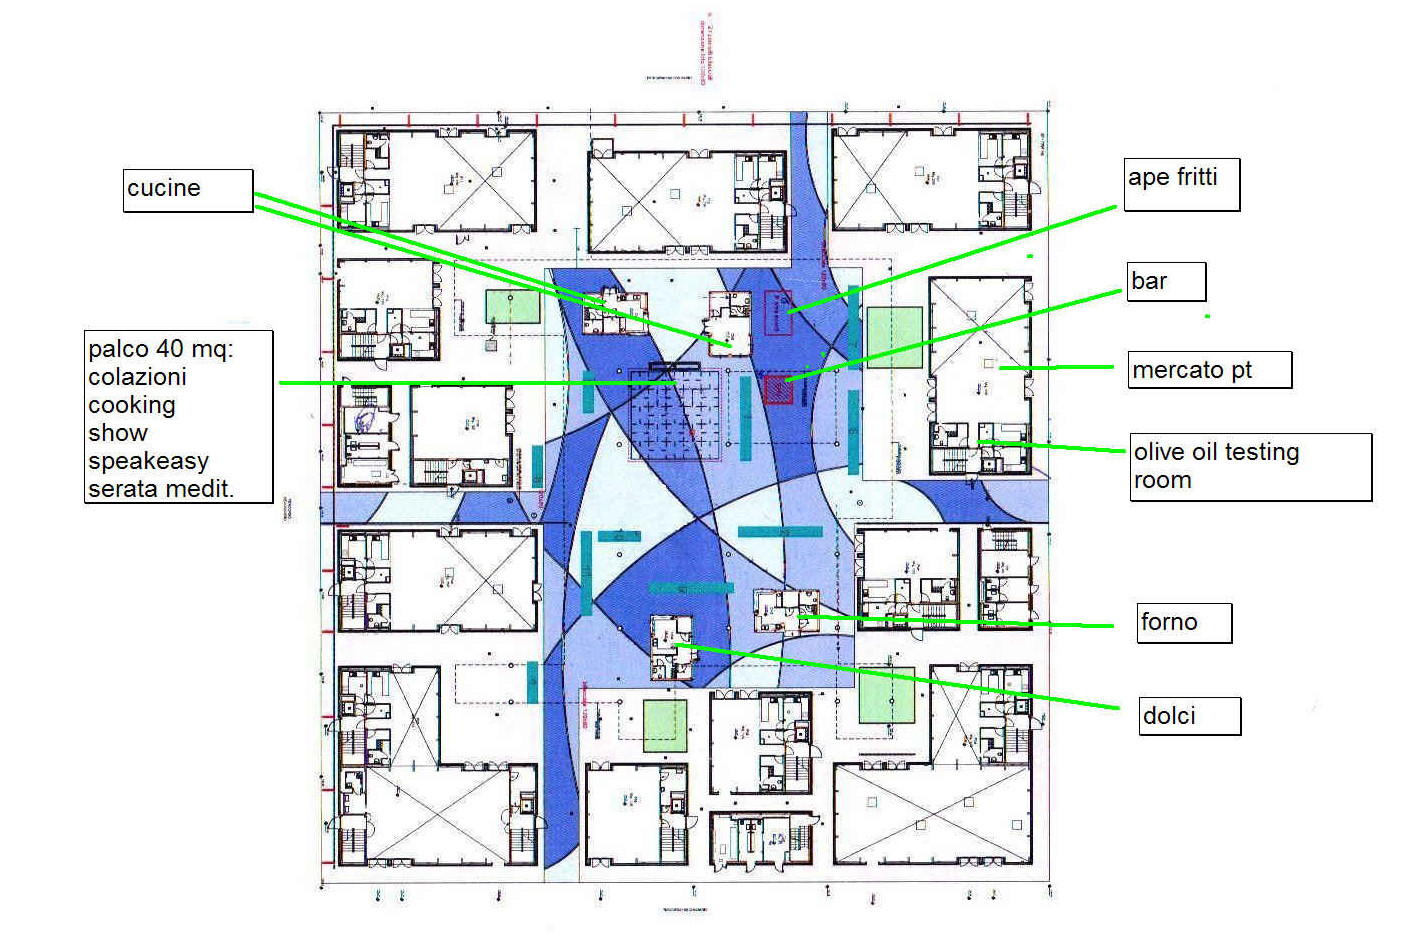 Cluster Biomediterraneo interior map